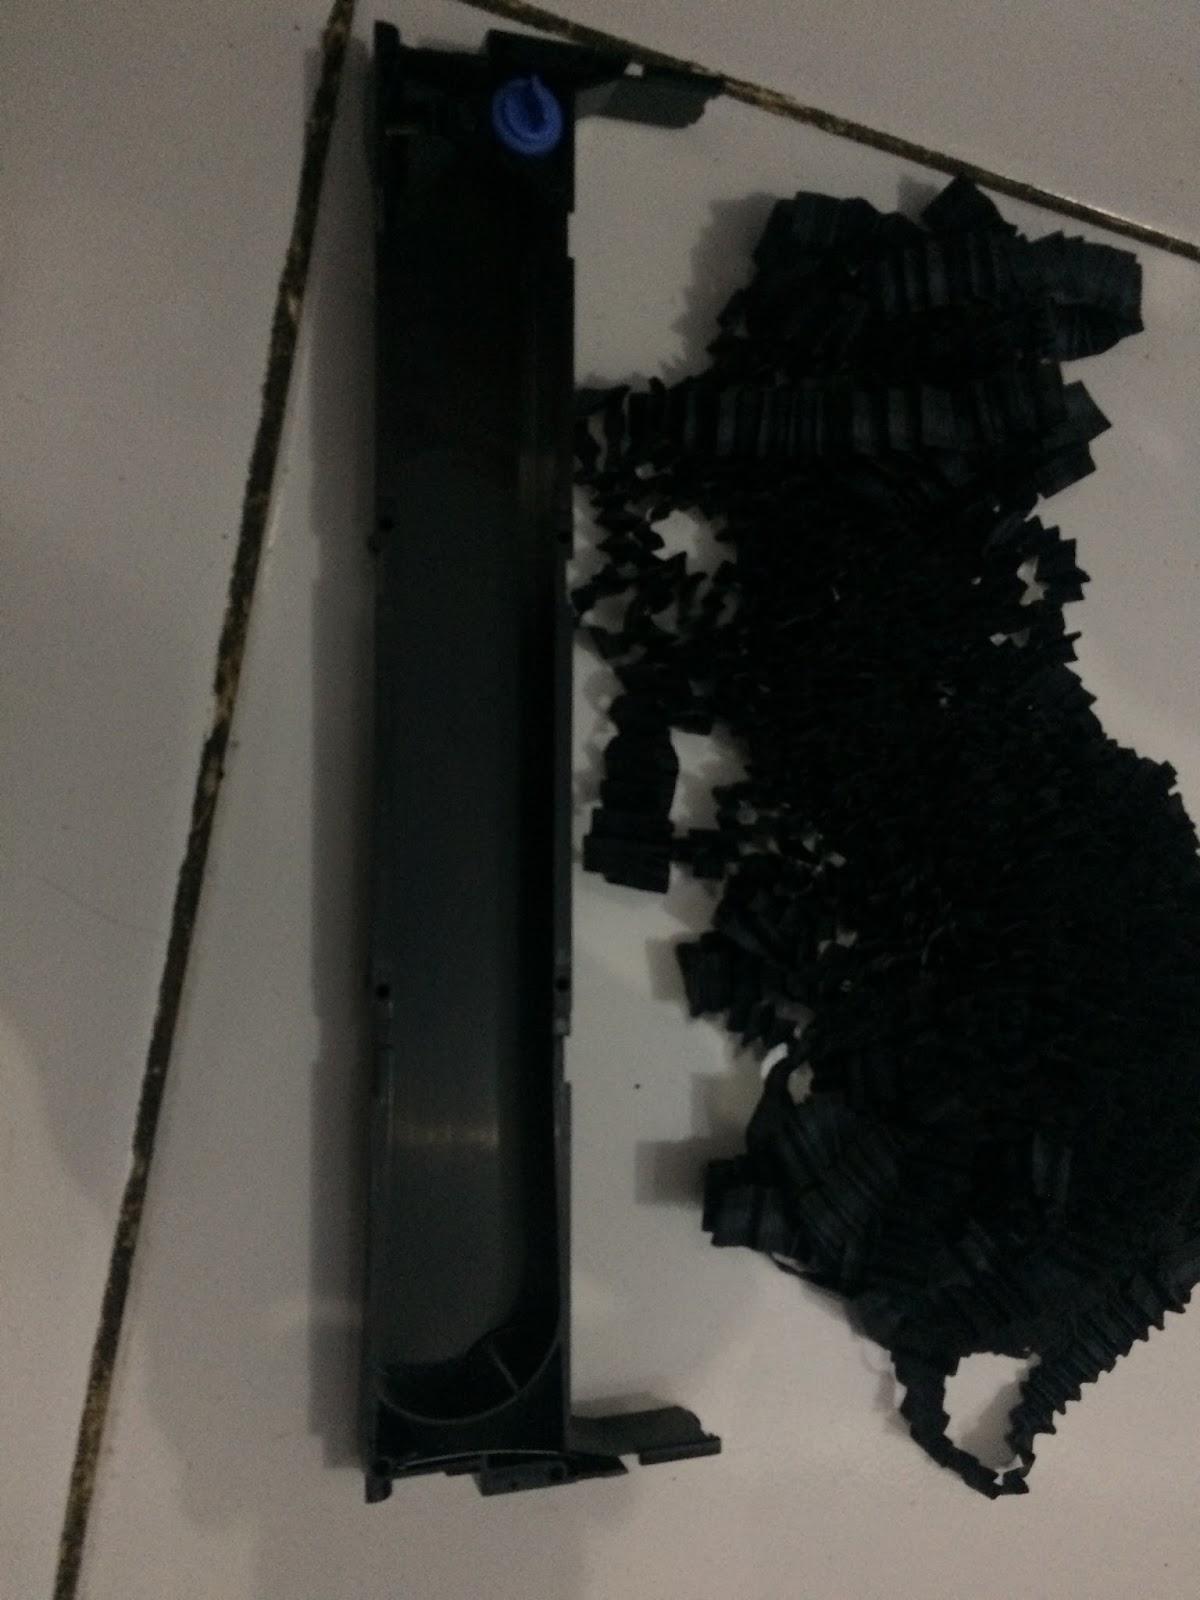 Cara Memasang Pita Printer Epson Lx 310 Sumberkomputer 2 Setelah Terbuka Lepaskan Yang Ada Di Dalam Casing Tersebut Lihat Gambar